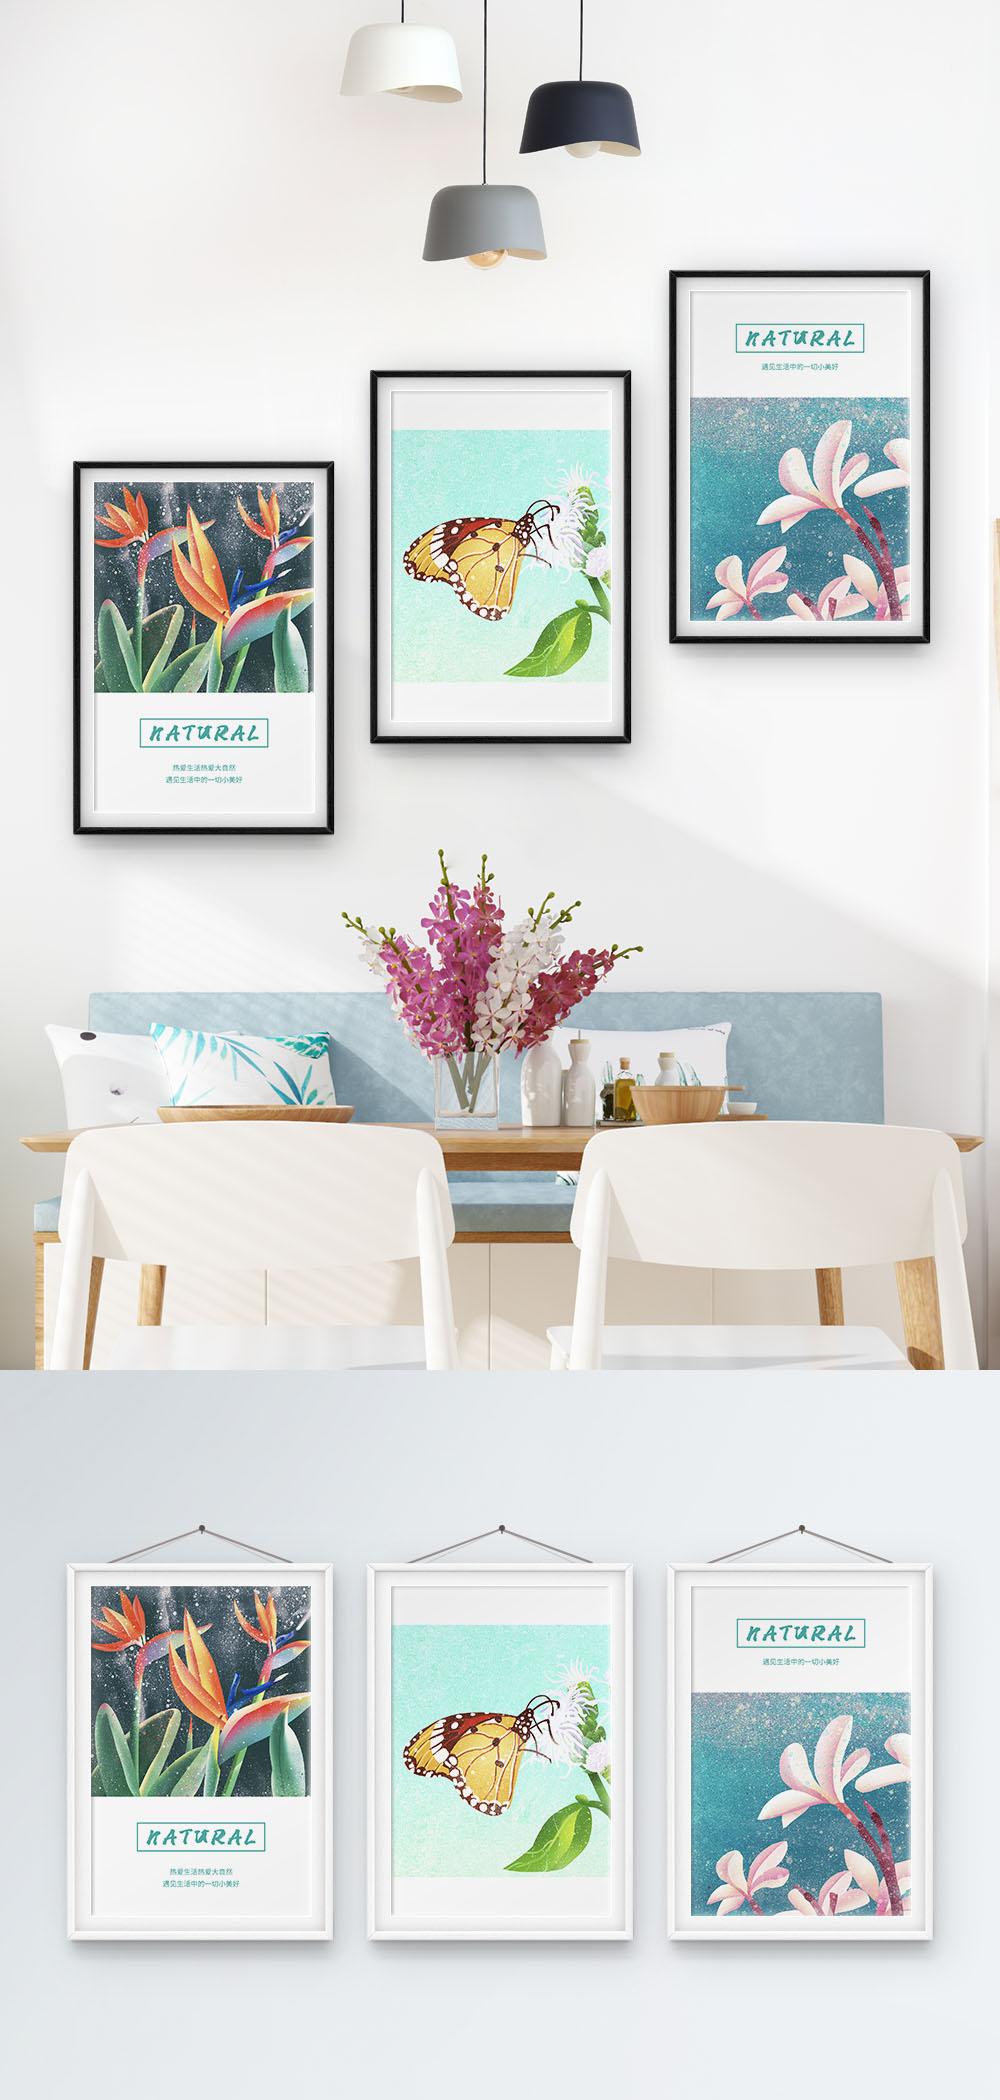 Flora Dan Fauna Hangat Nordik Lukisan Dekoratif Tiga Bingkai